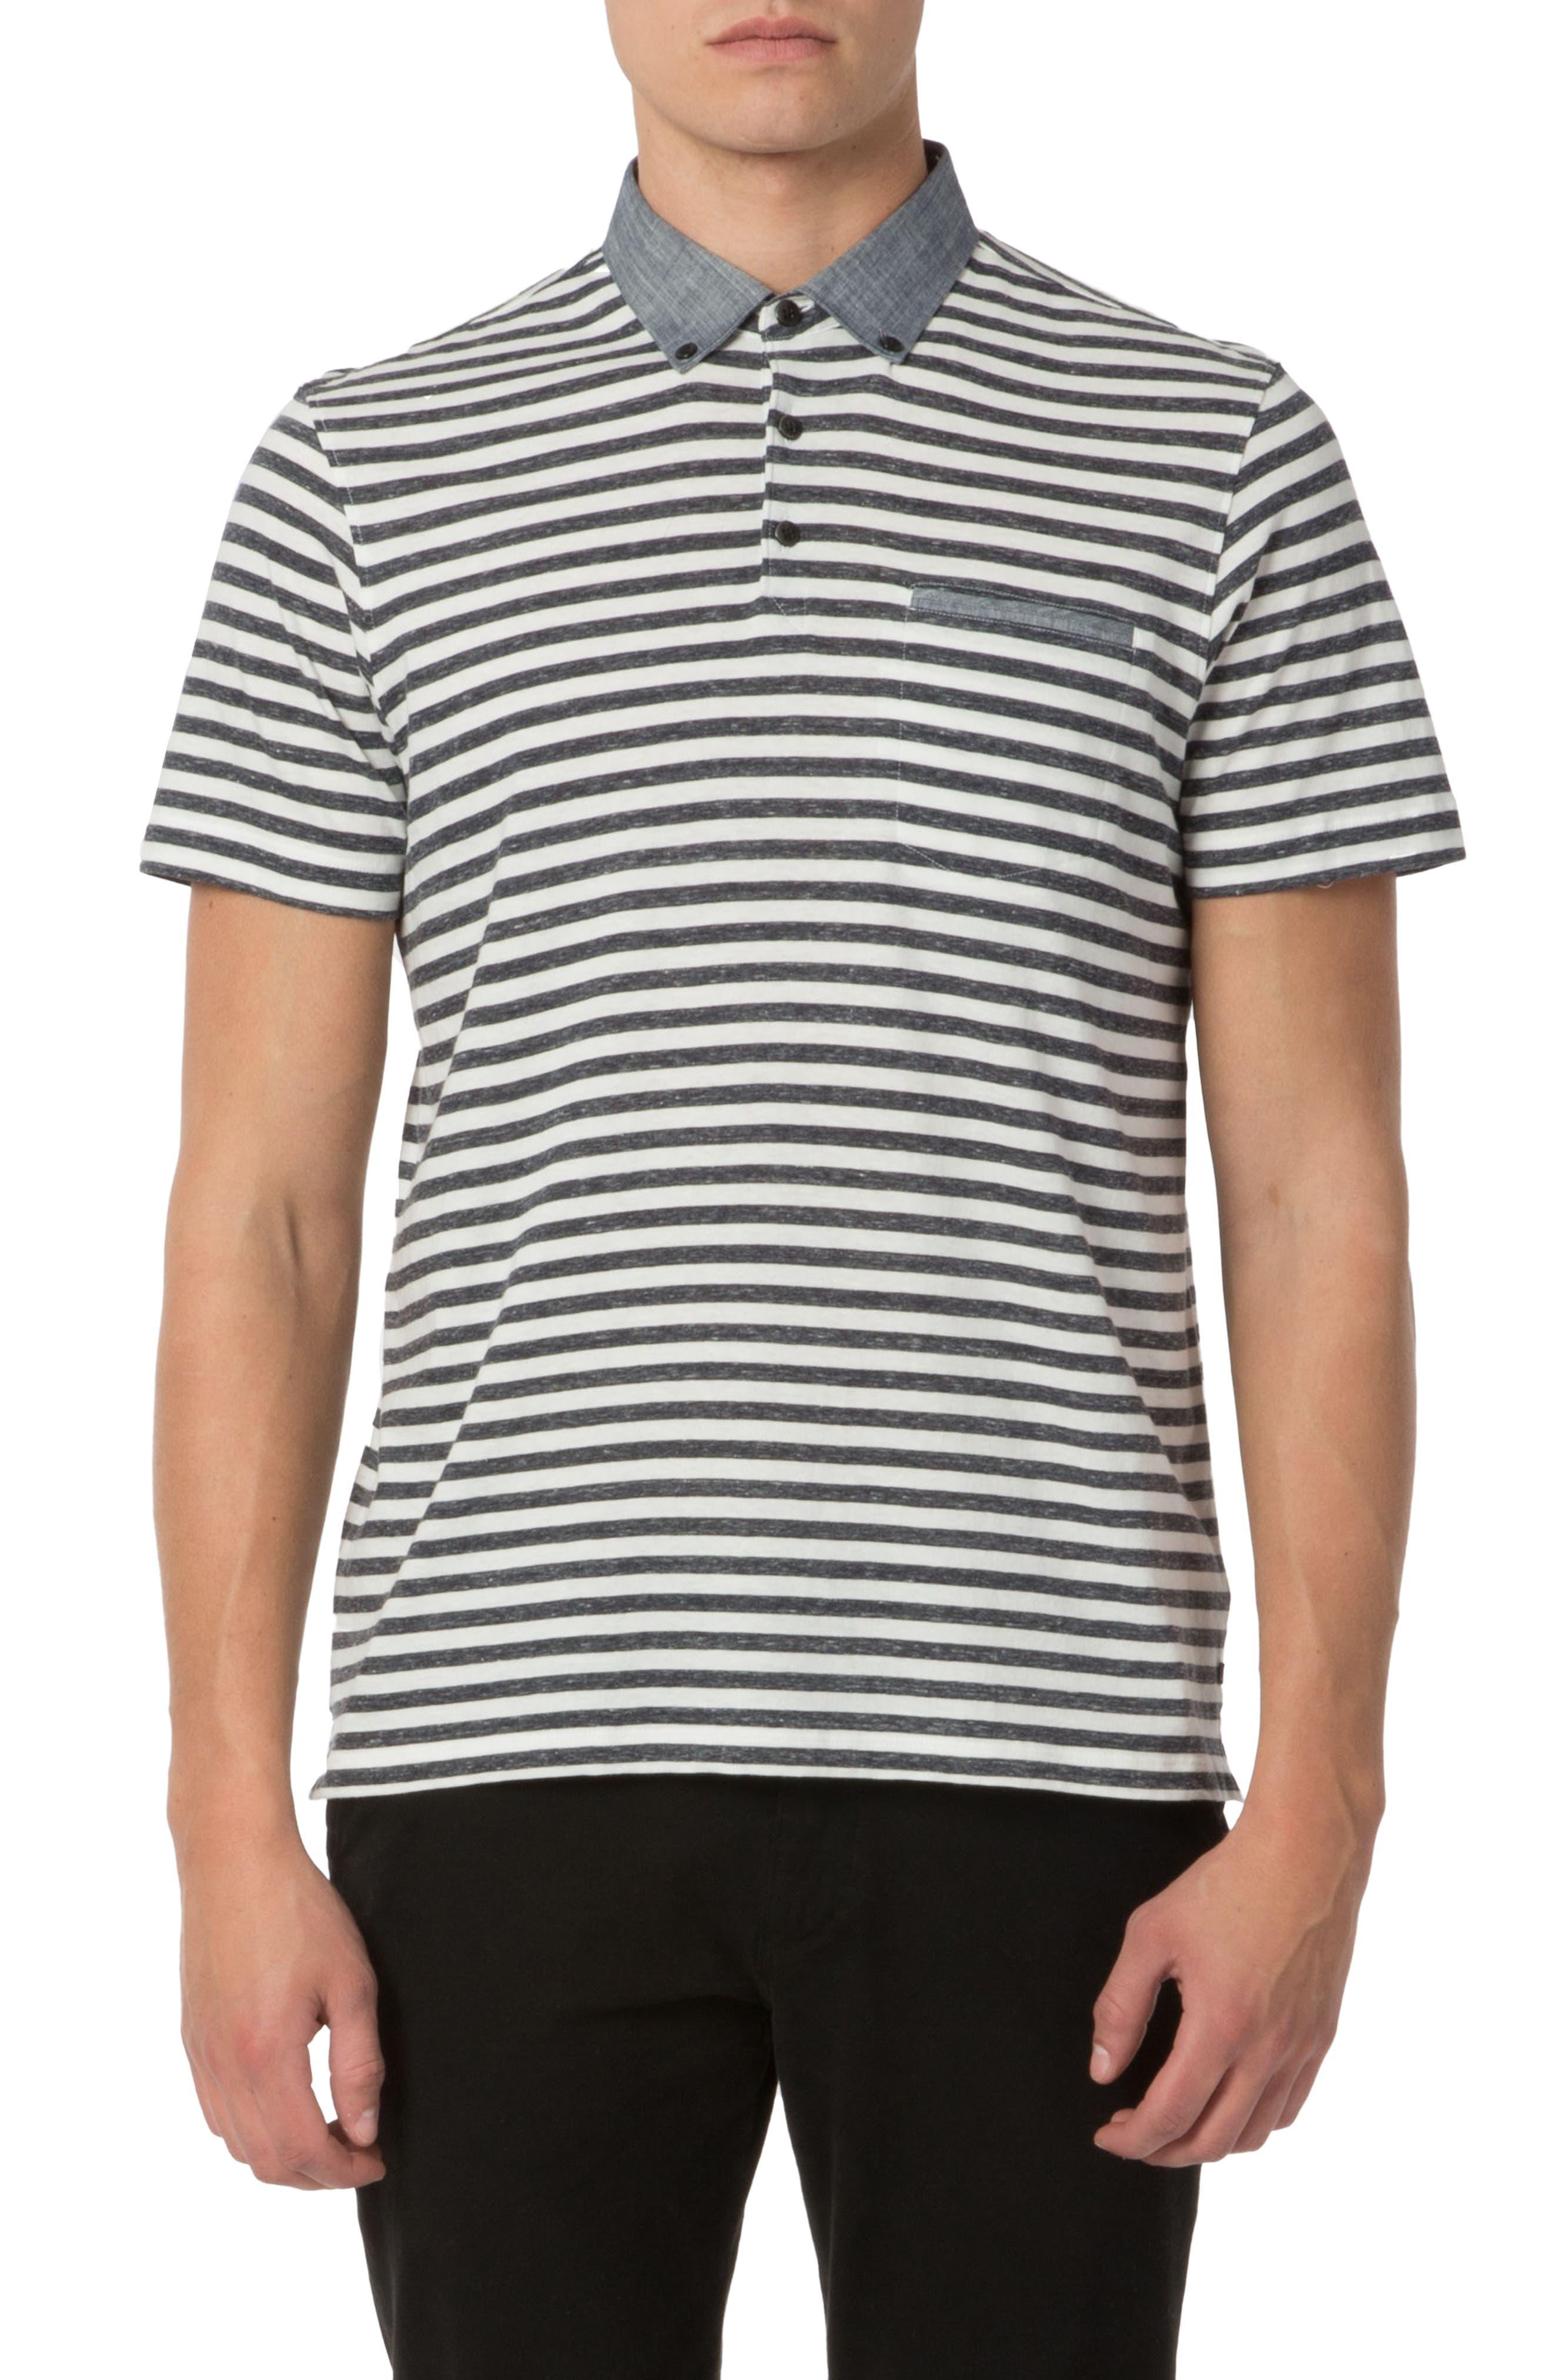 Main Image - Good Man Brand Trim Fit Stripe Linen Polo